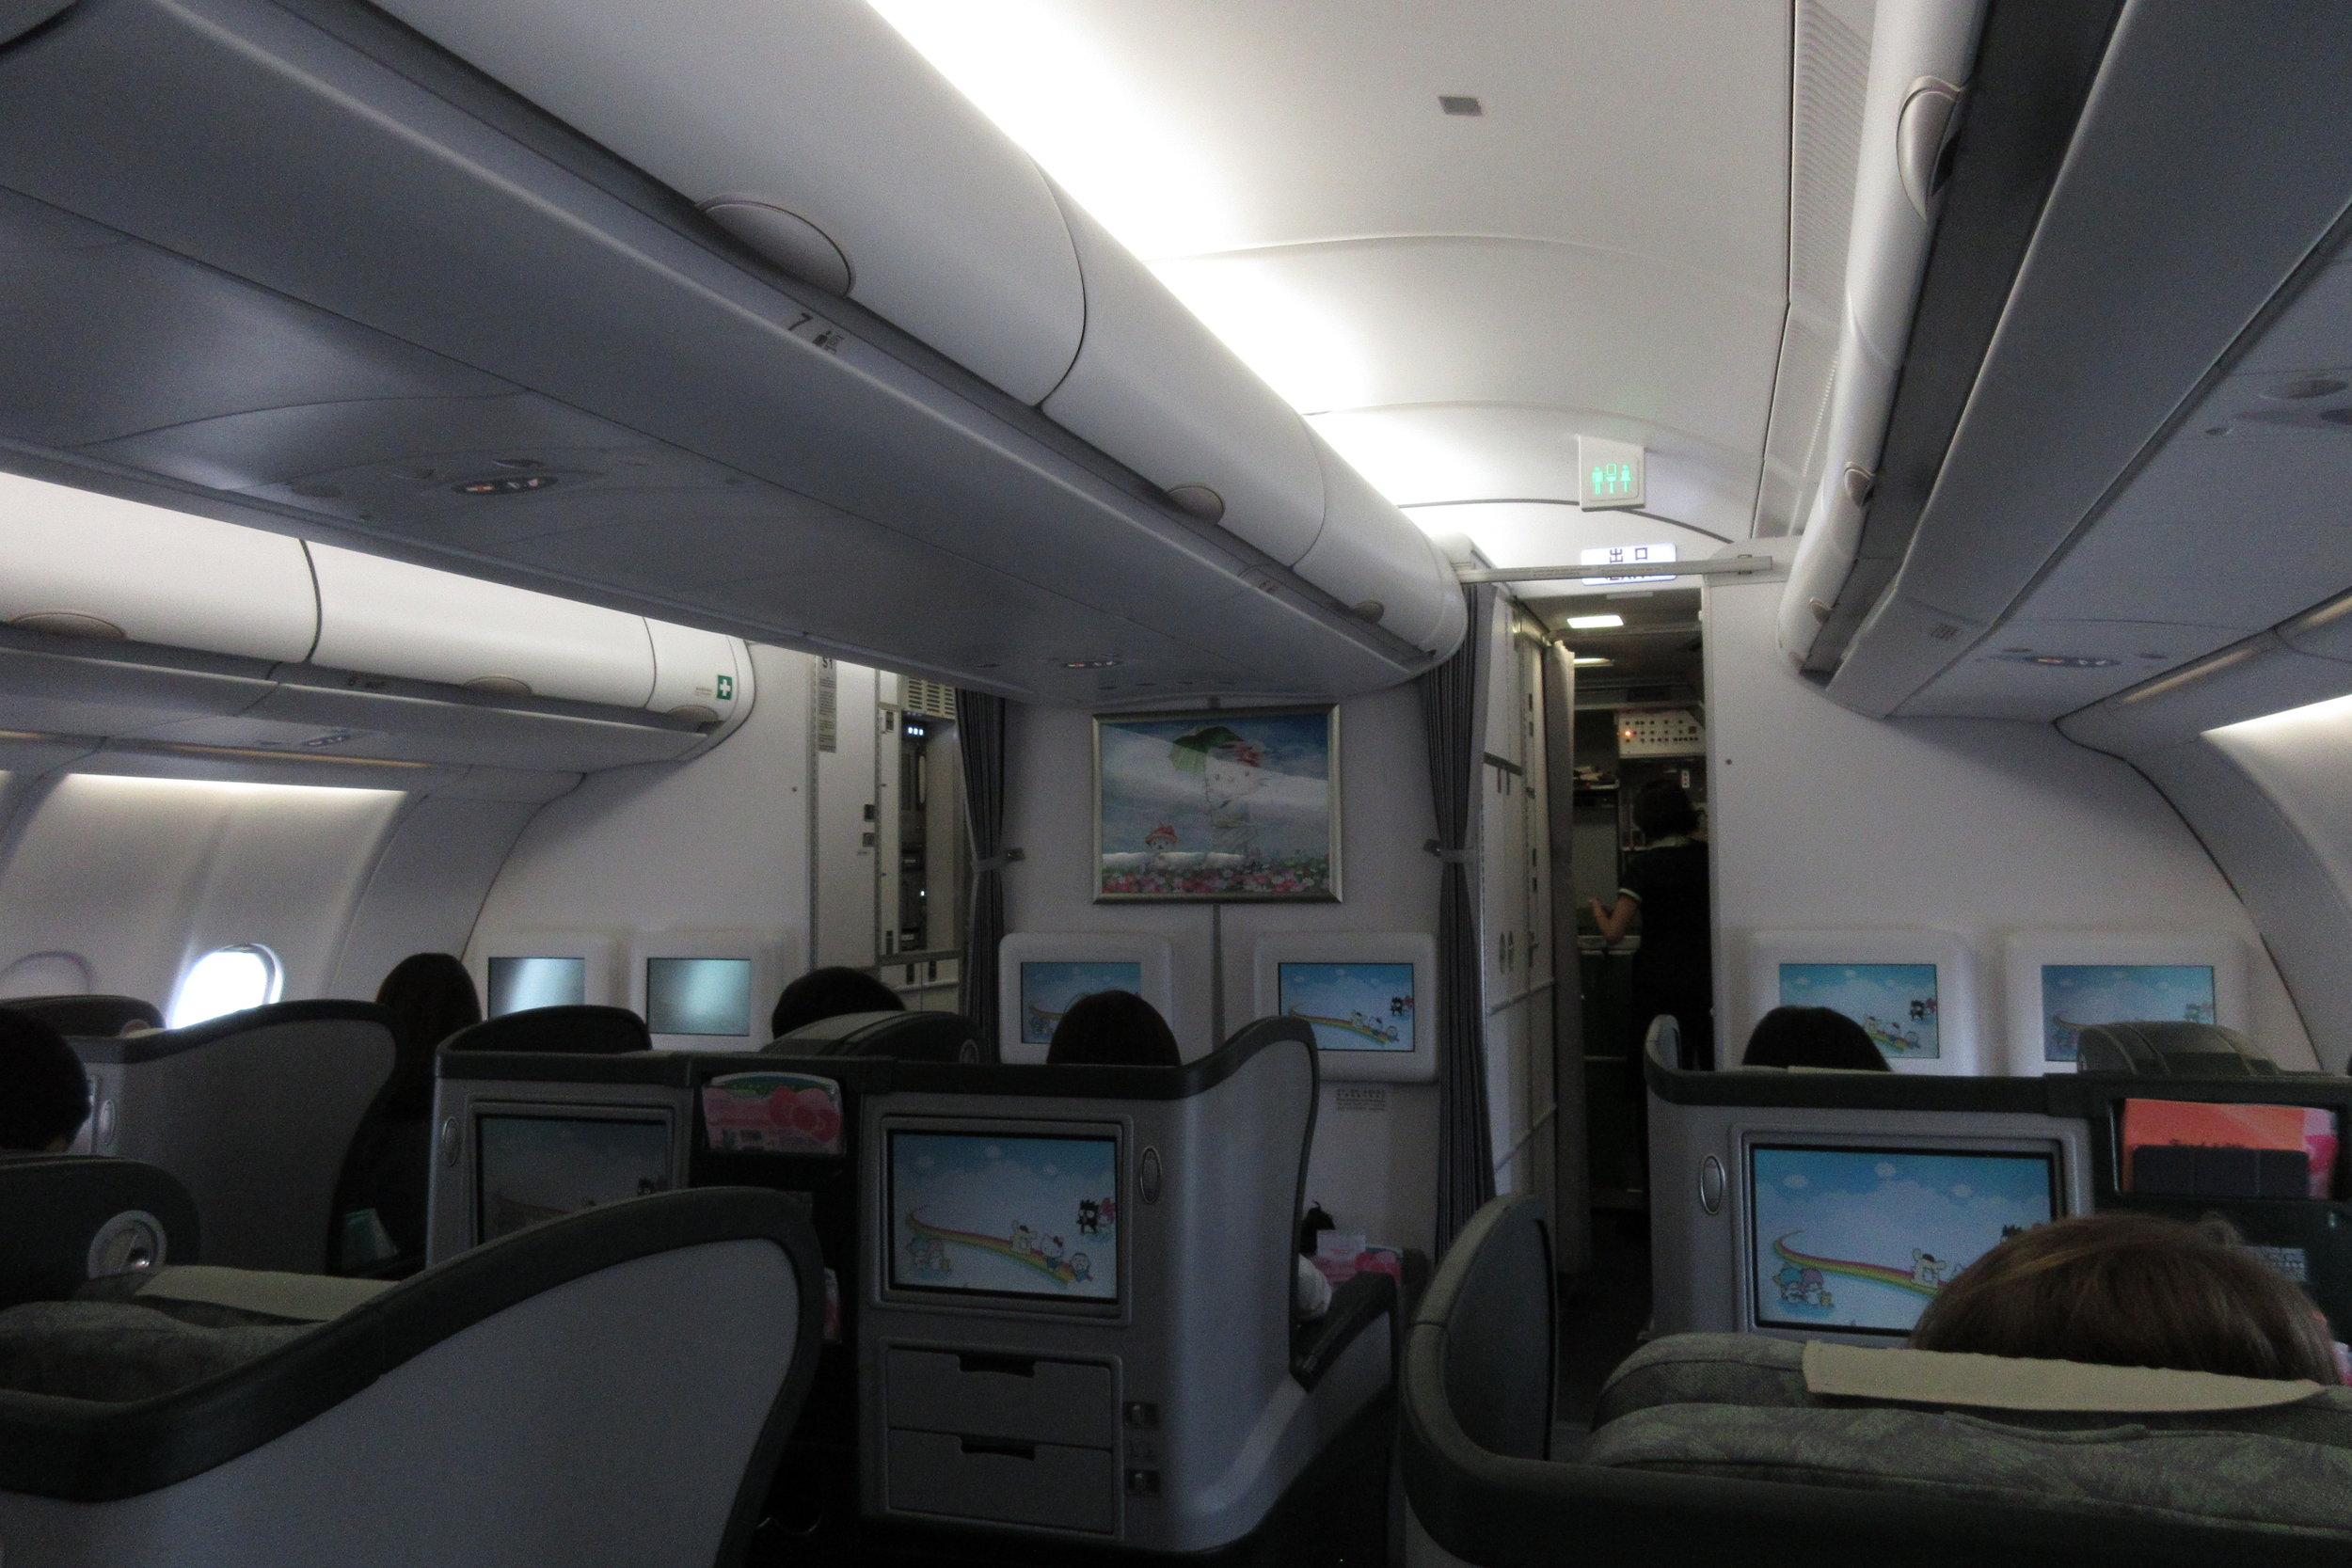 EVA Air regional business class – Cabin